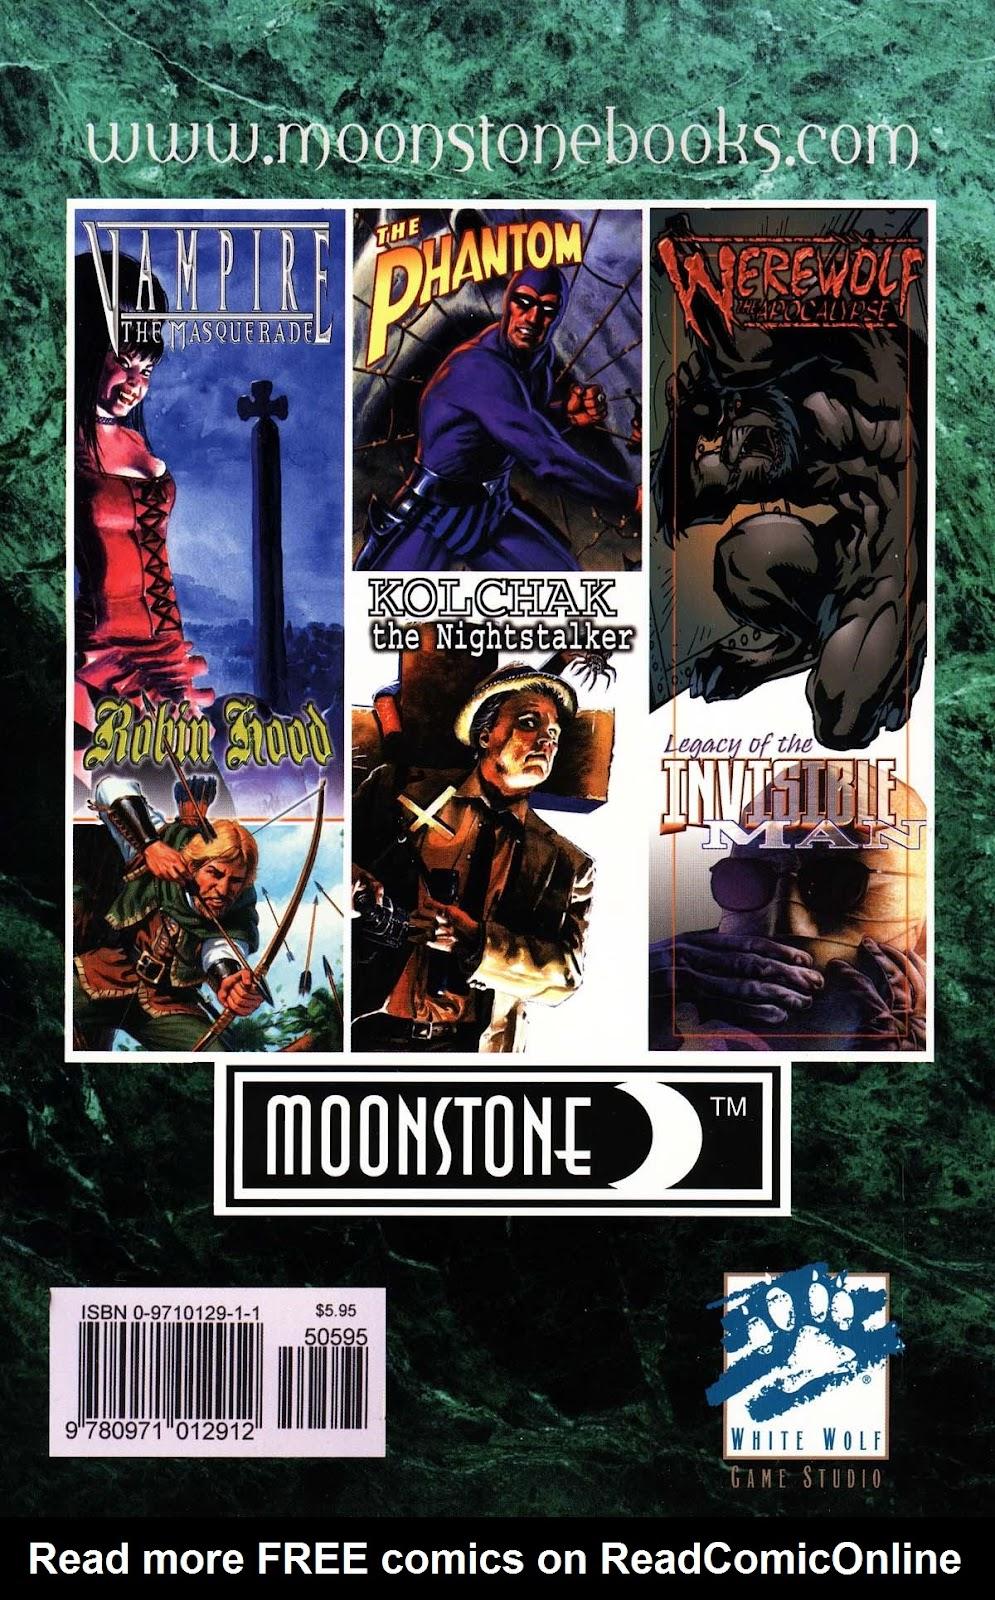 Read online Vampire the Masquerade comic -  Issue # Toreador - 52